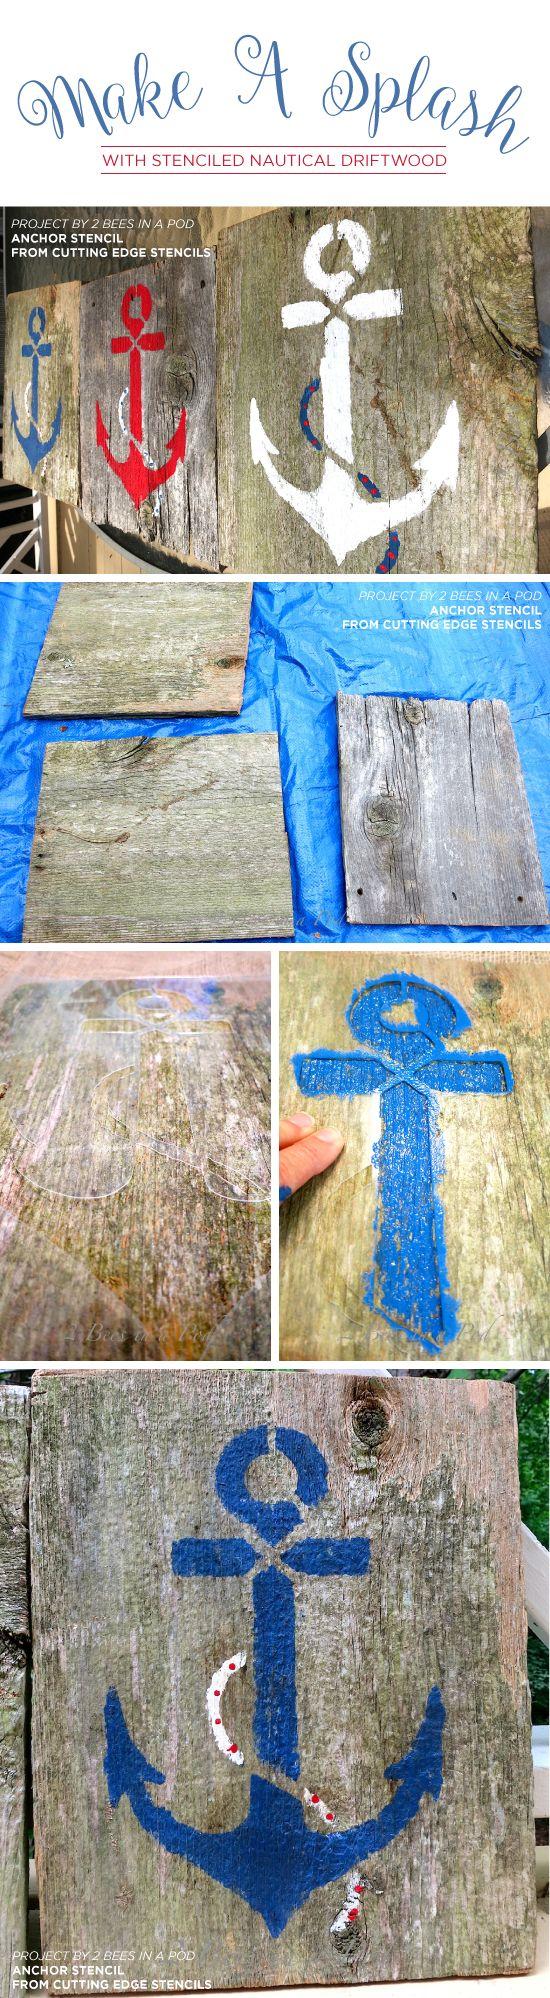 Besides cross clip art wall decor decorative wood cross decorative - Cutting Edge Stencils Shares Easy Diy Driftwood And Reclaimed Wood Art Ideas Using Beach Decor Stencils